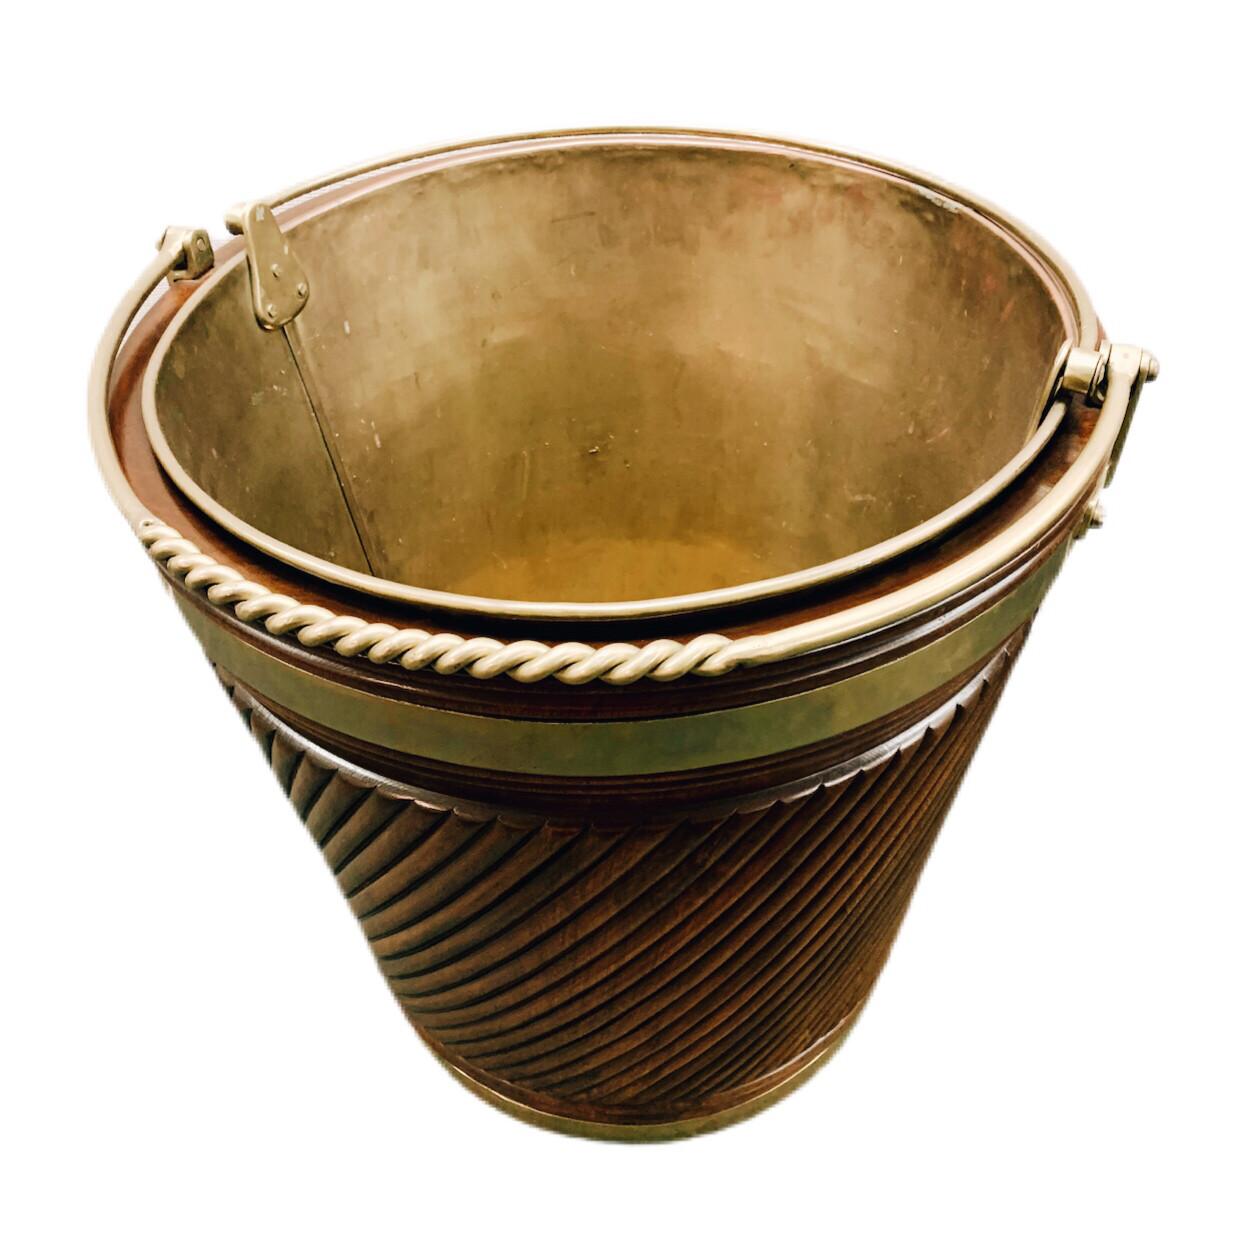 Irish Mahogany Peat/Turf Bucket With Handled Copper Liner